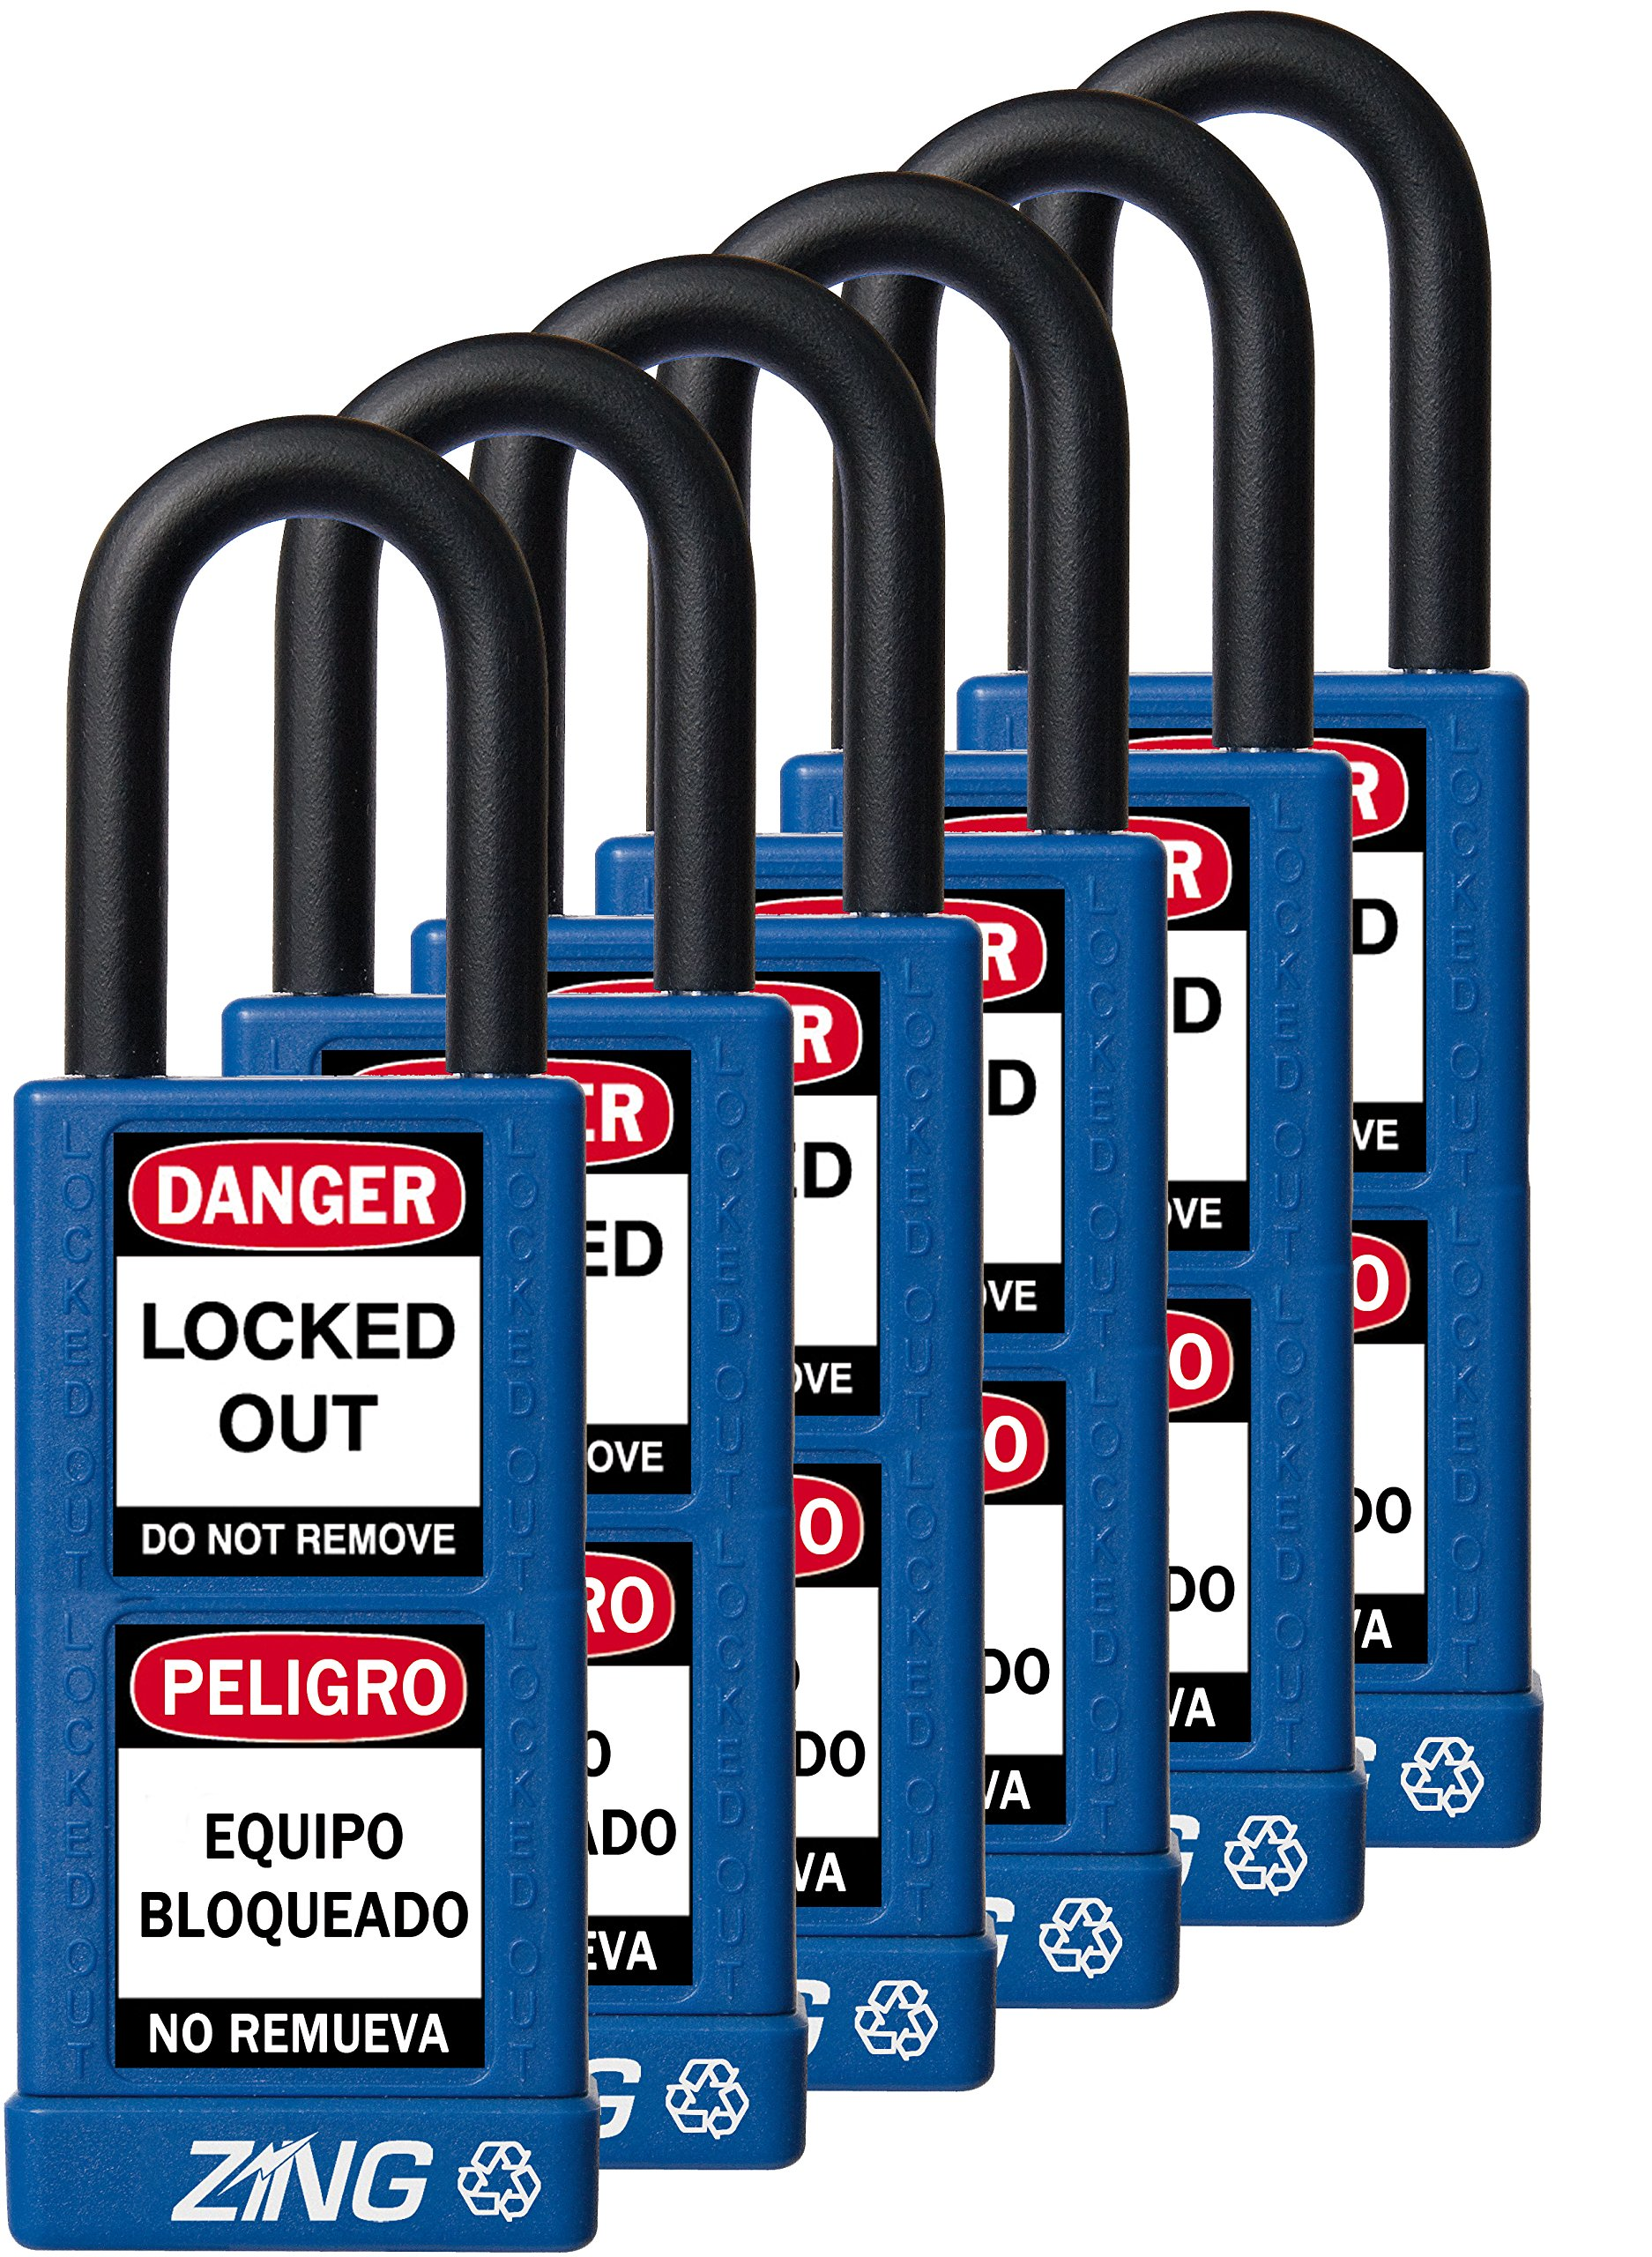 ZING 7089 RecycLock Safety Padlock, Keyed Alike,1-1/2'' Shackle, 3'' Long Body, Blue, 6 Pack